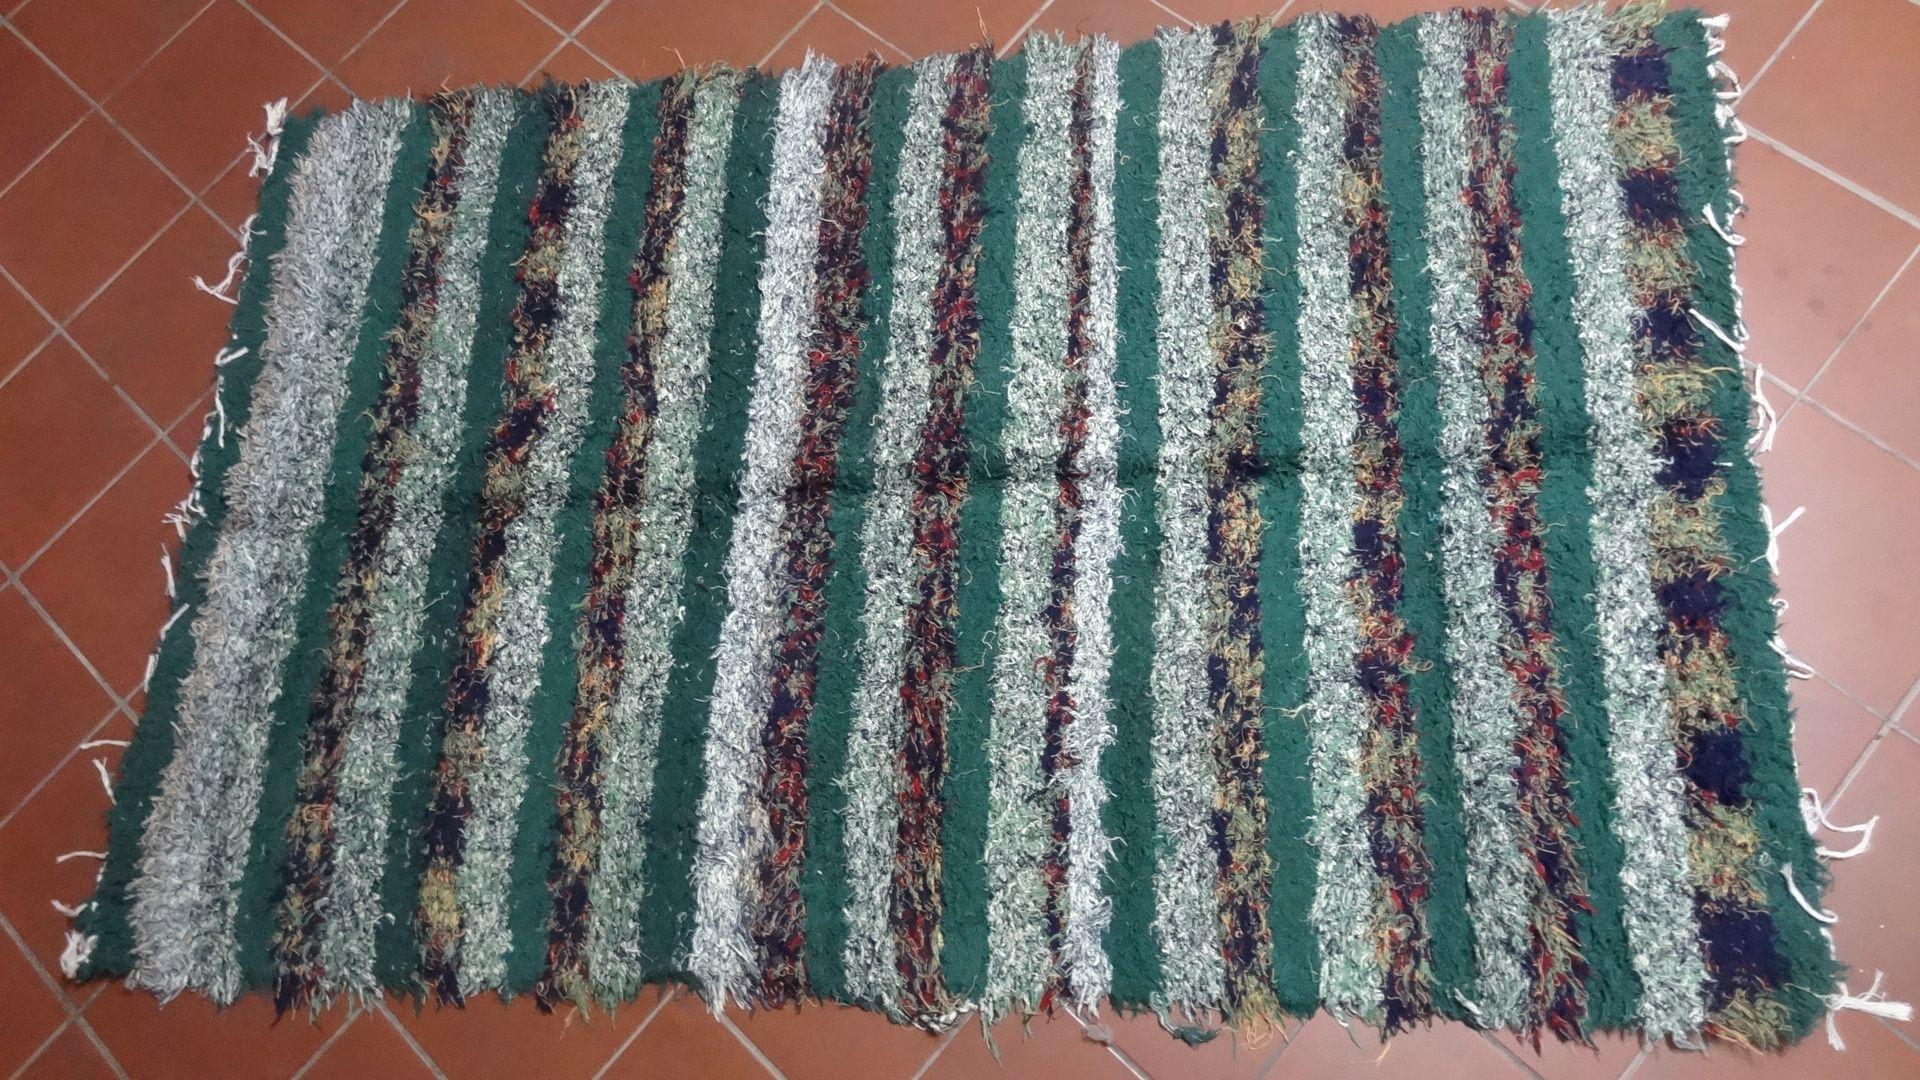 jarapa, alfombra alpujarreña en tonos verdes de pelo extra